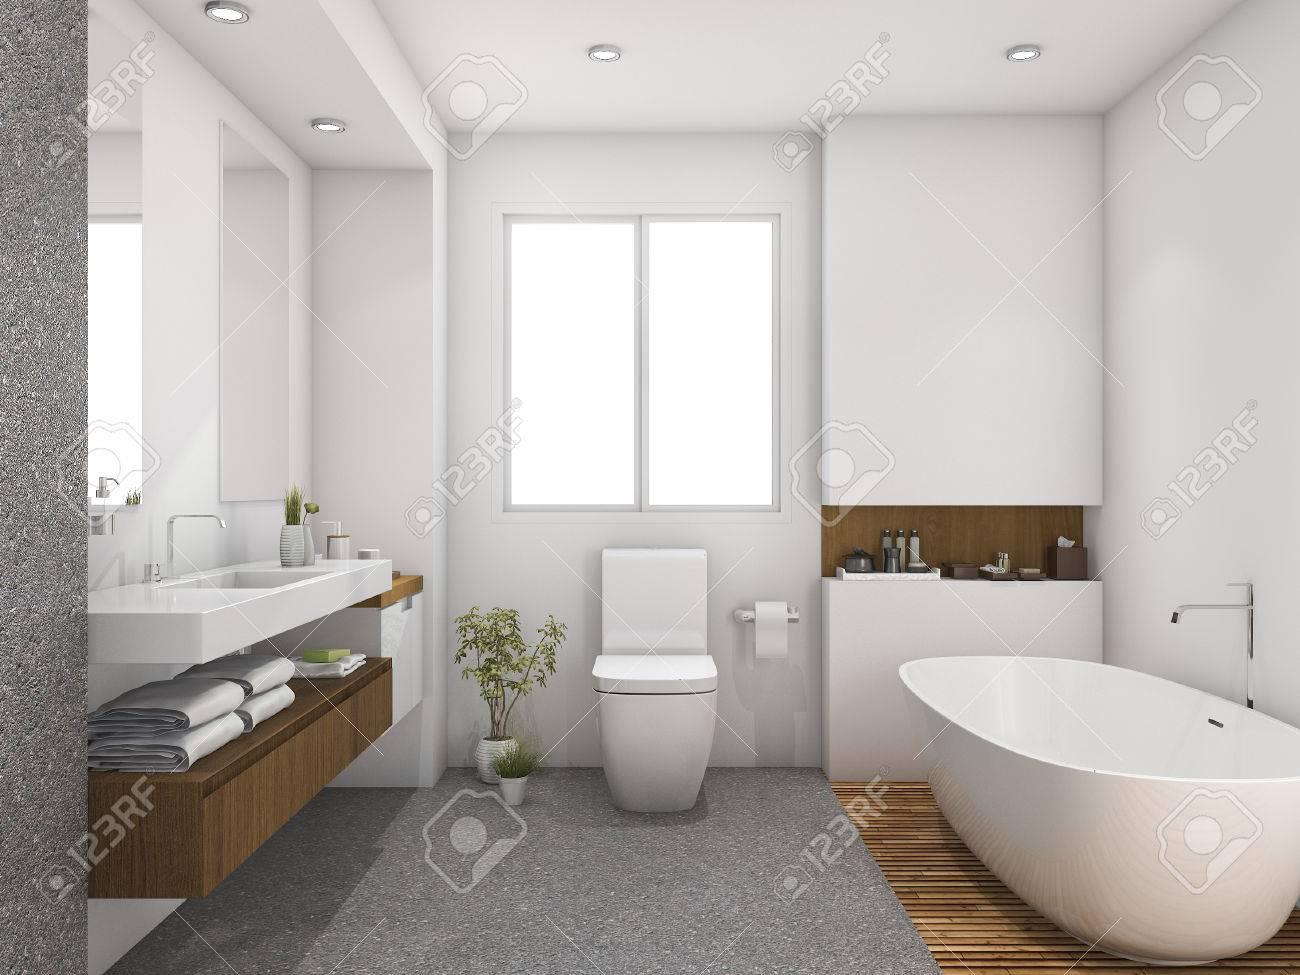 3d Rendering Wood And Tile Design Bathroom Near Window Stock Photo ...